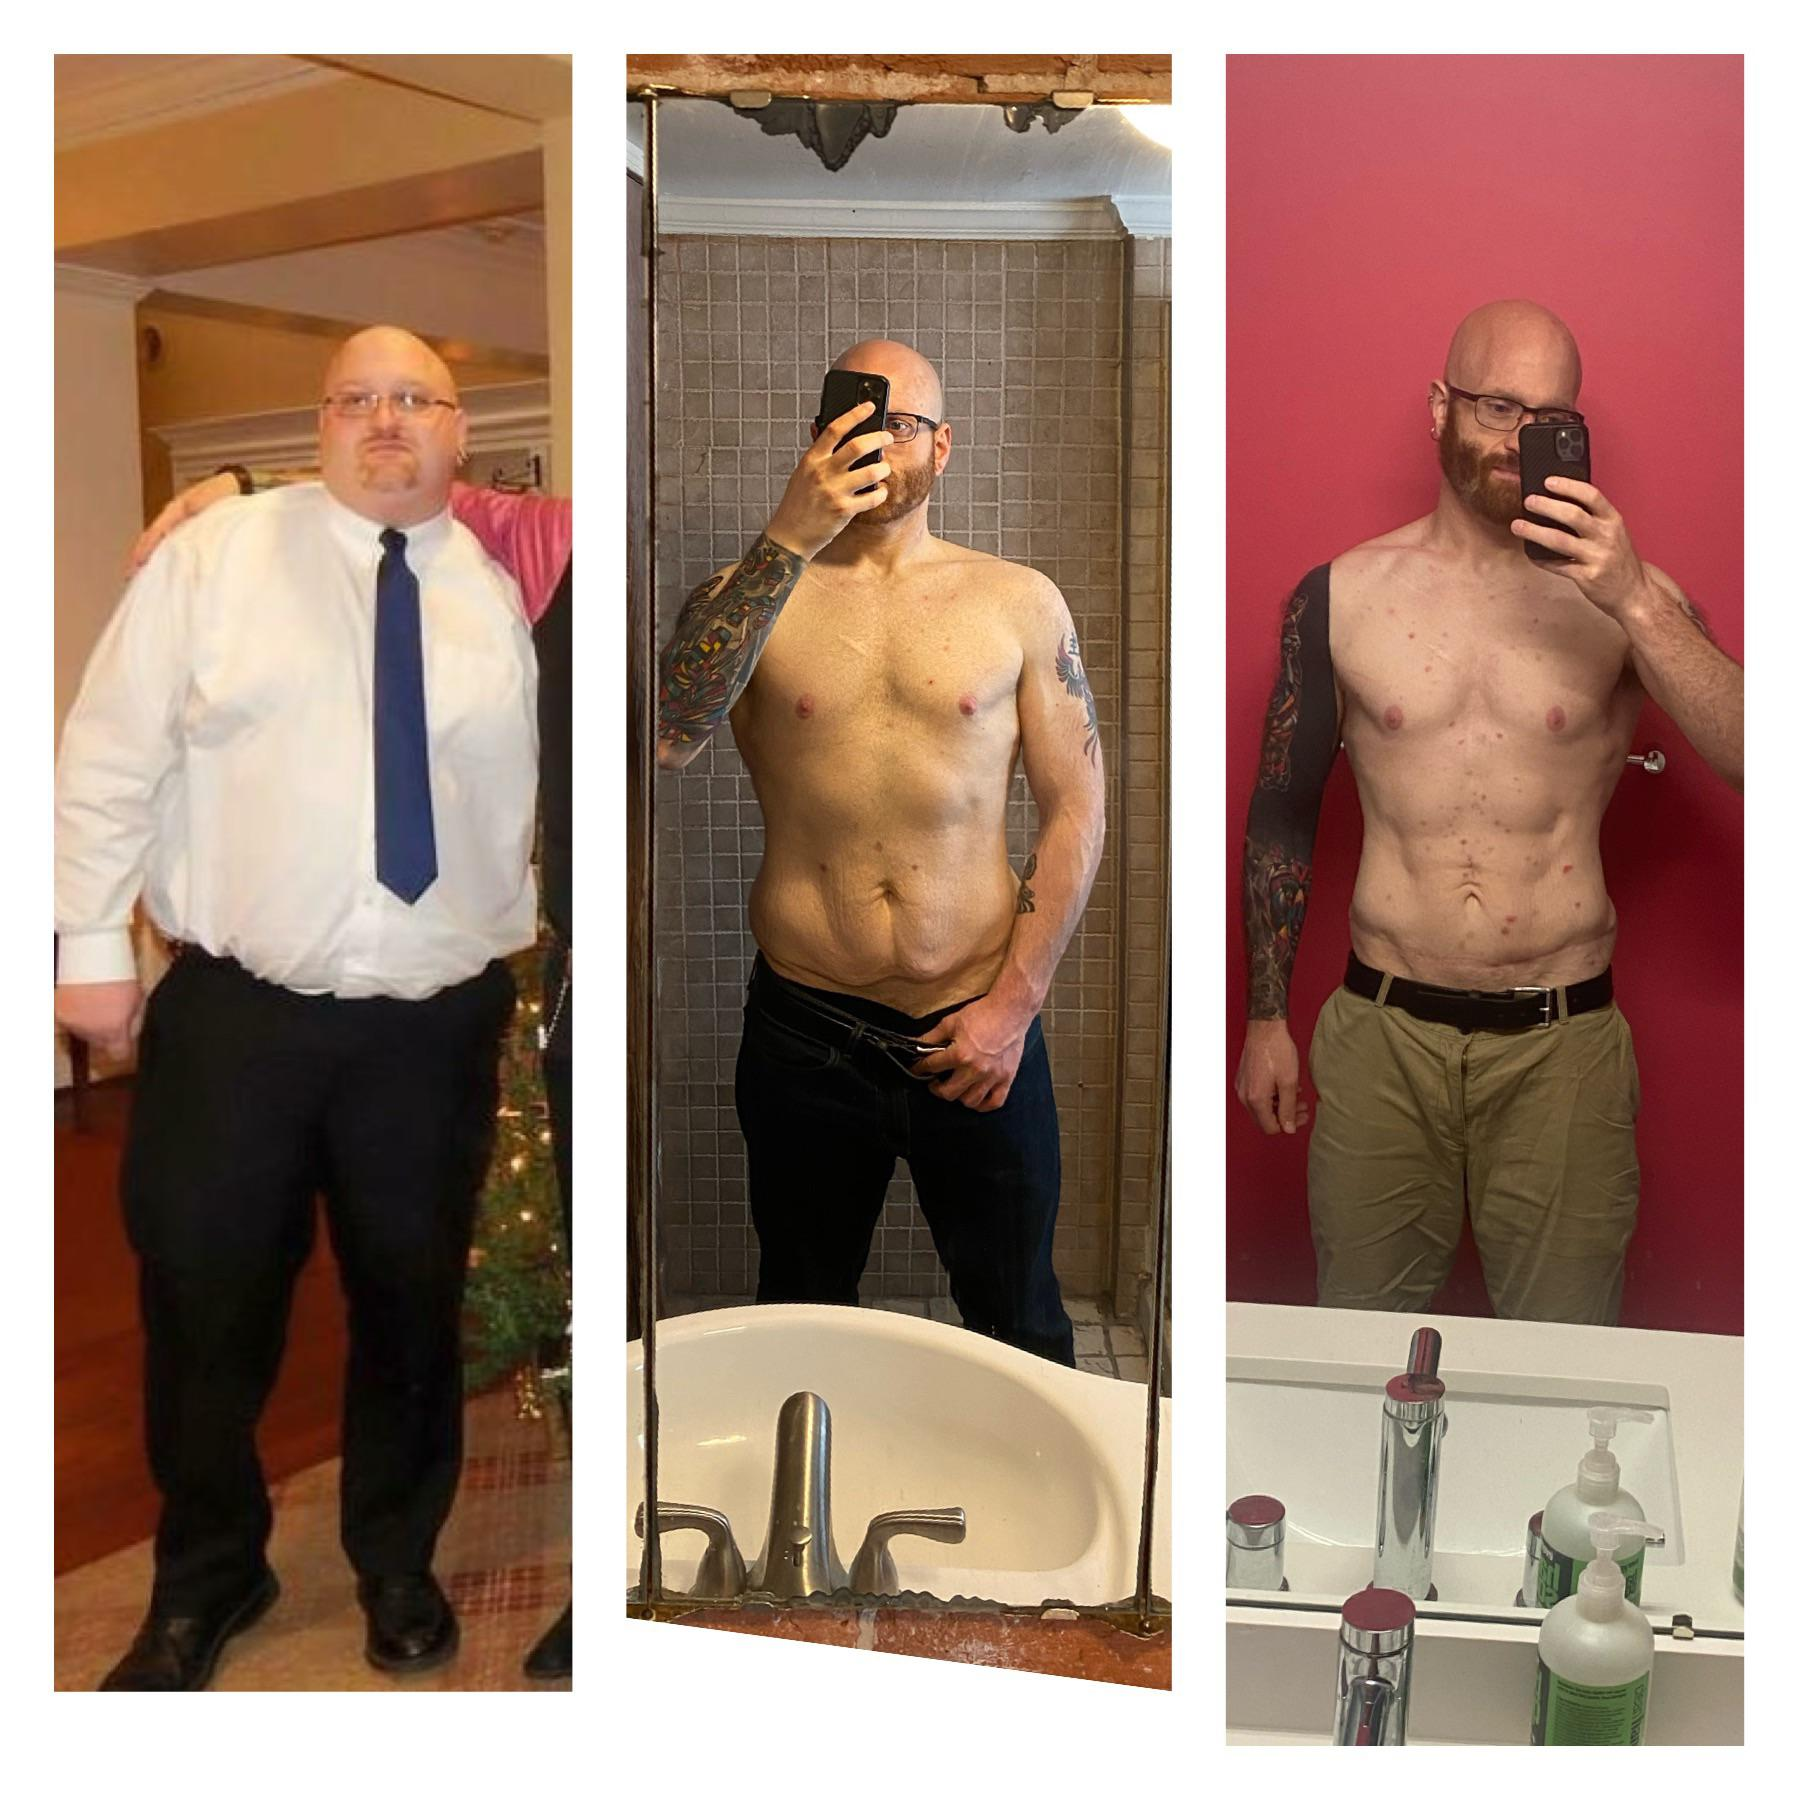 6 foot Male 164 lbs Fat Loss 356 lbs to 192 lbs